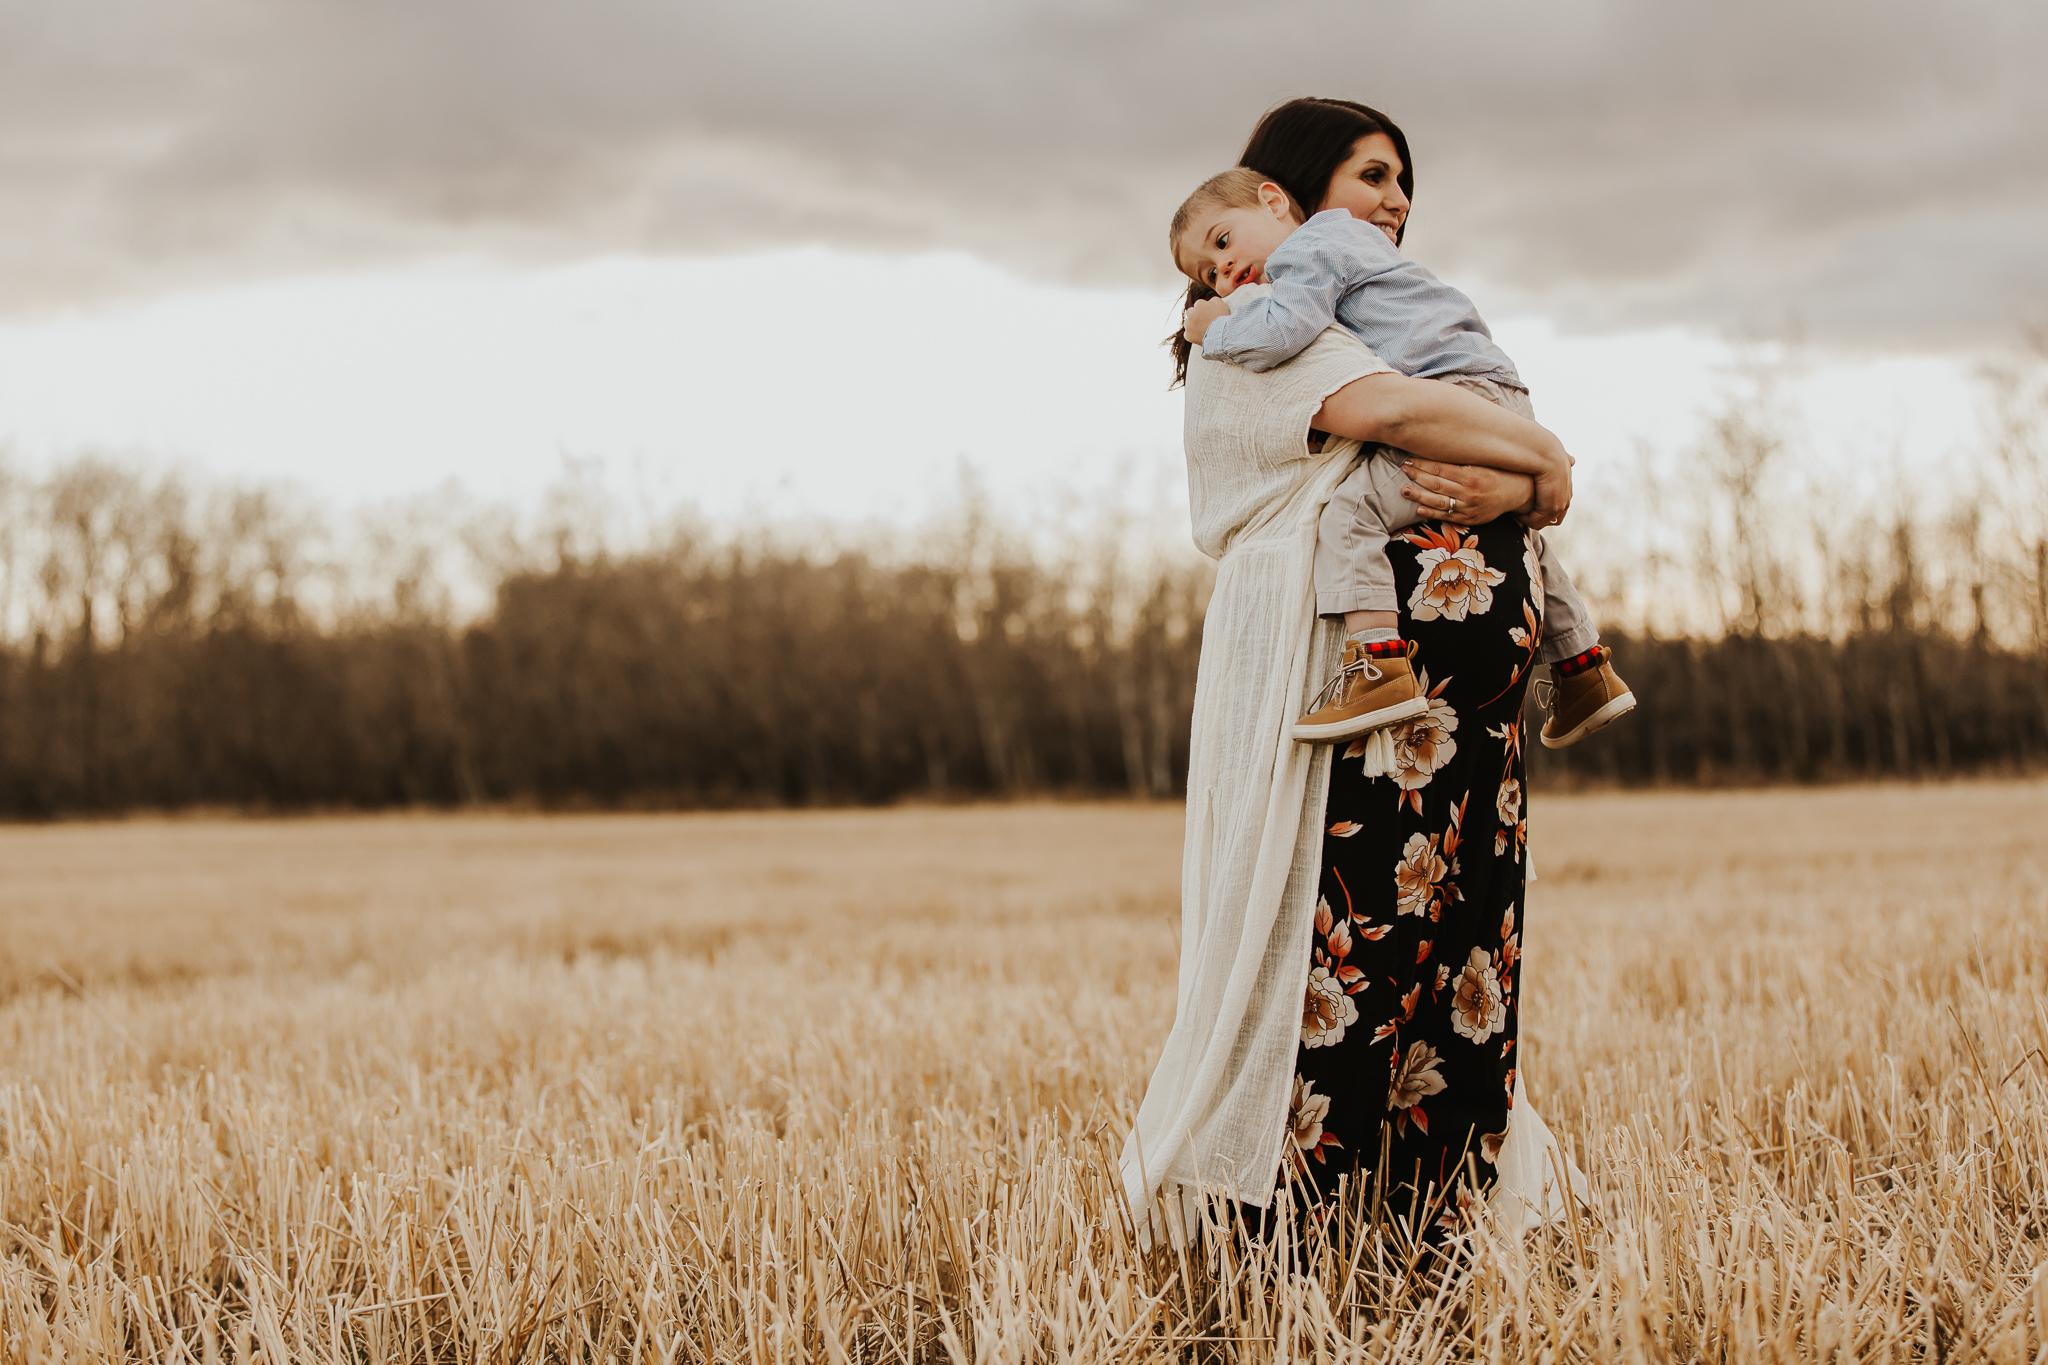 Alina-Joy-Photography-Cold-Lake-Maternity-Photographer-Josee-23.jpg